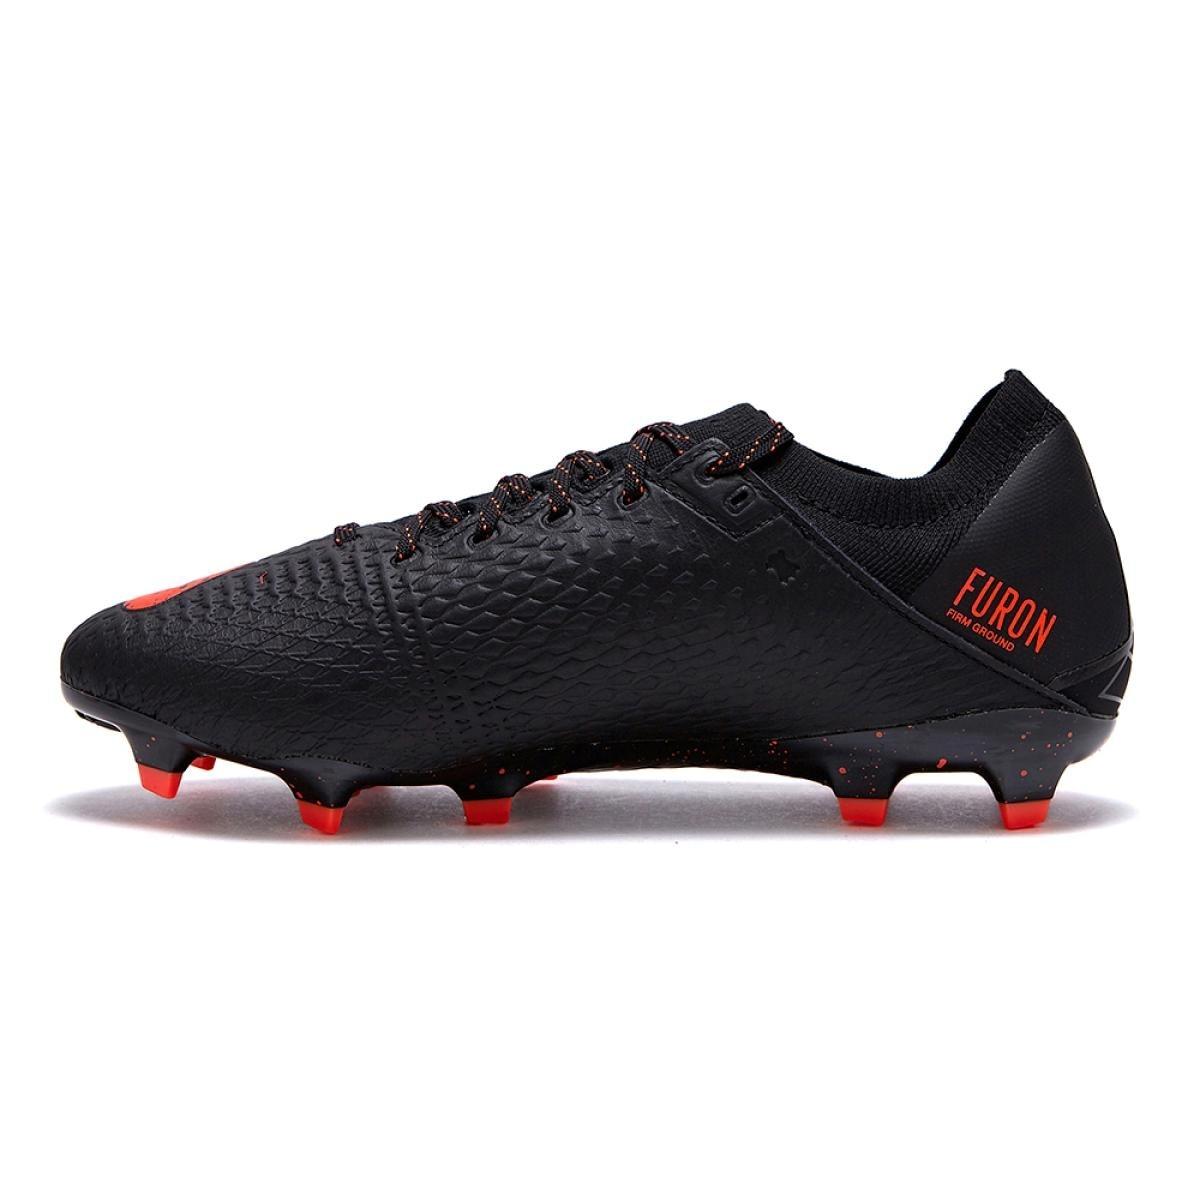 New Balance Furon 6 Pro FG Fotballsko Leather Pack